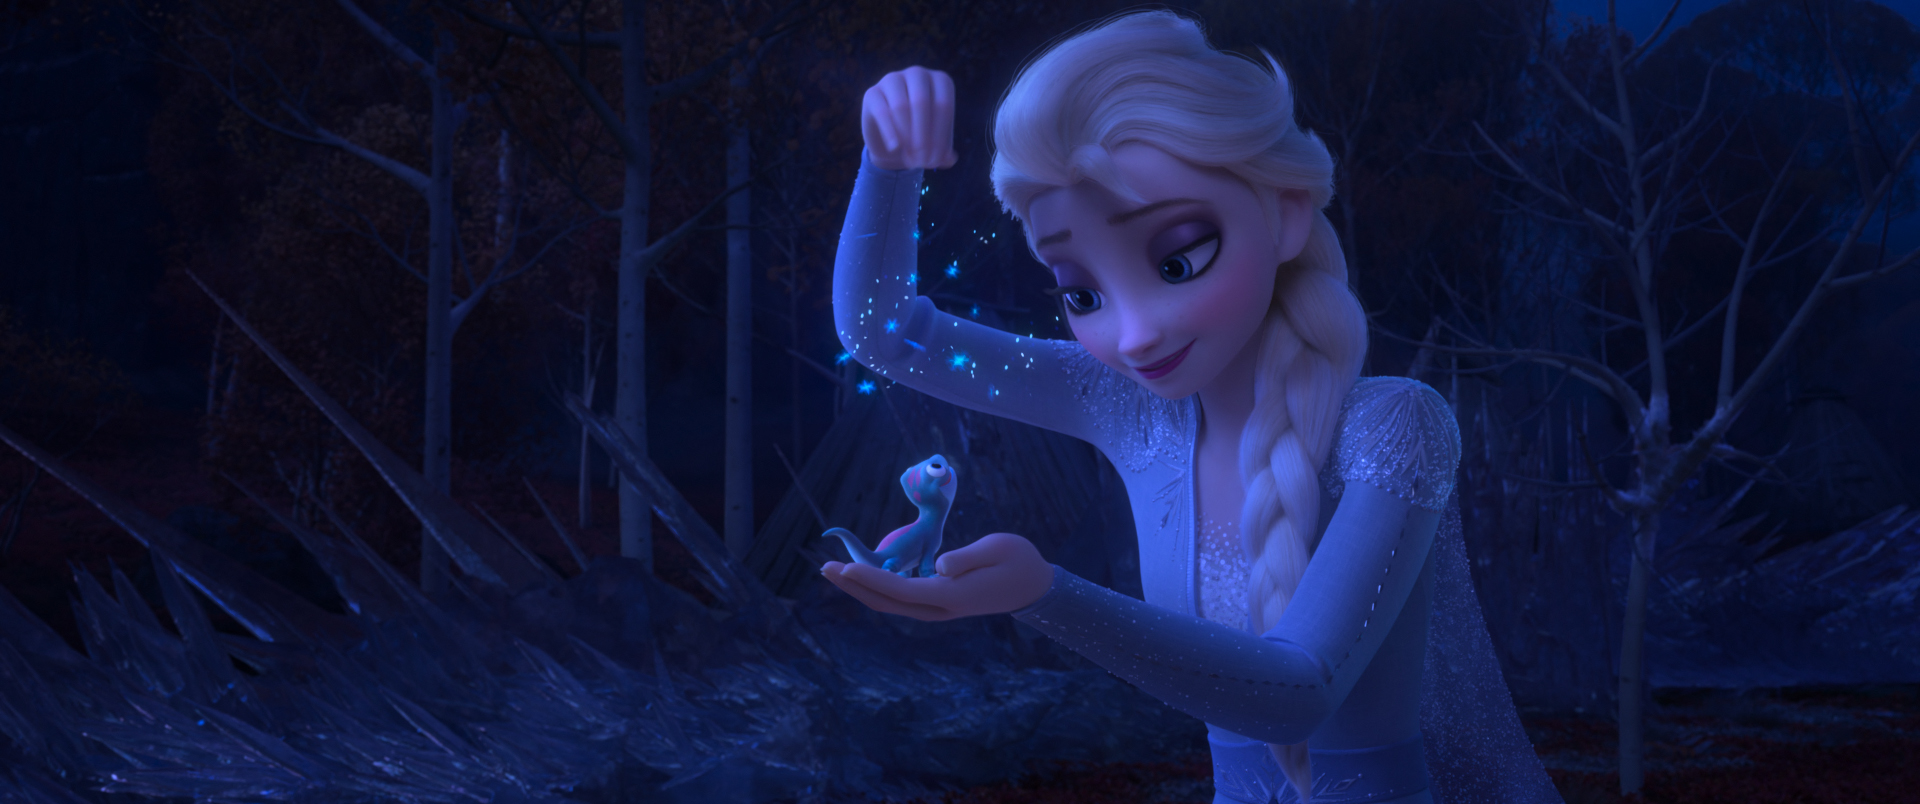 Frozen-2-Bruni